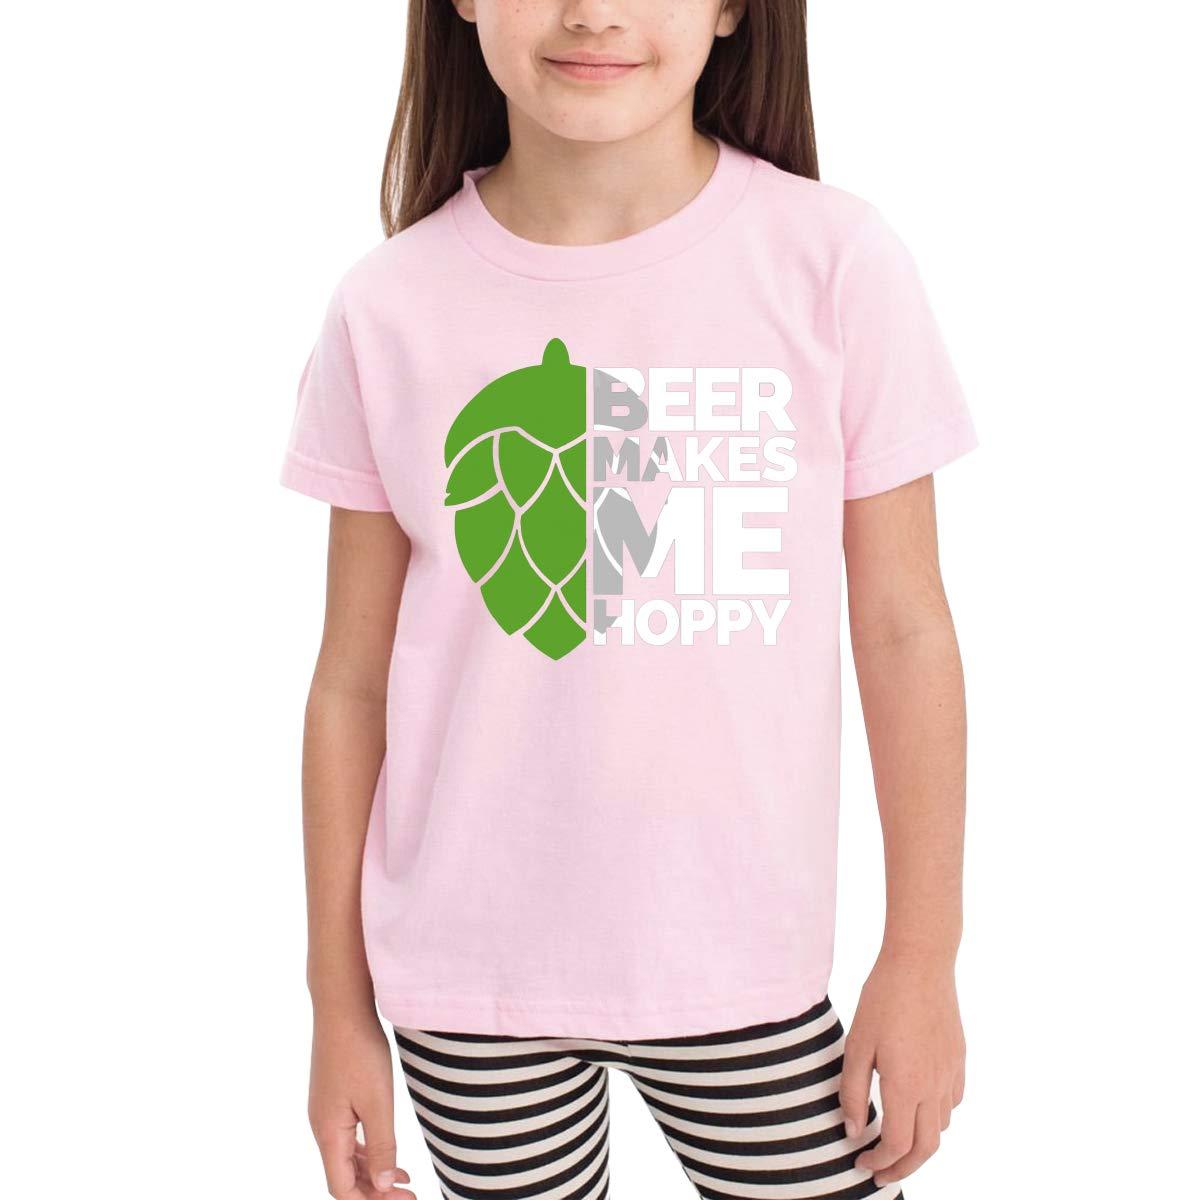 Beer Makes Me Hoppy Unisex Youths Short Sleeve T-Shirt Kids T-Shirt Tops Black